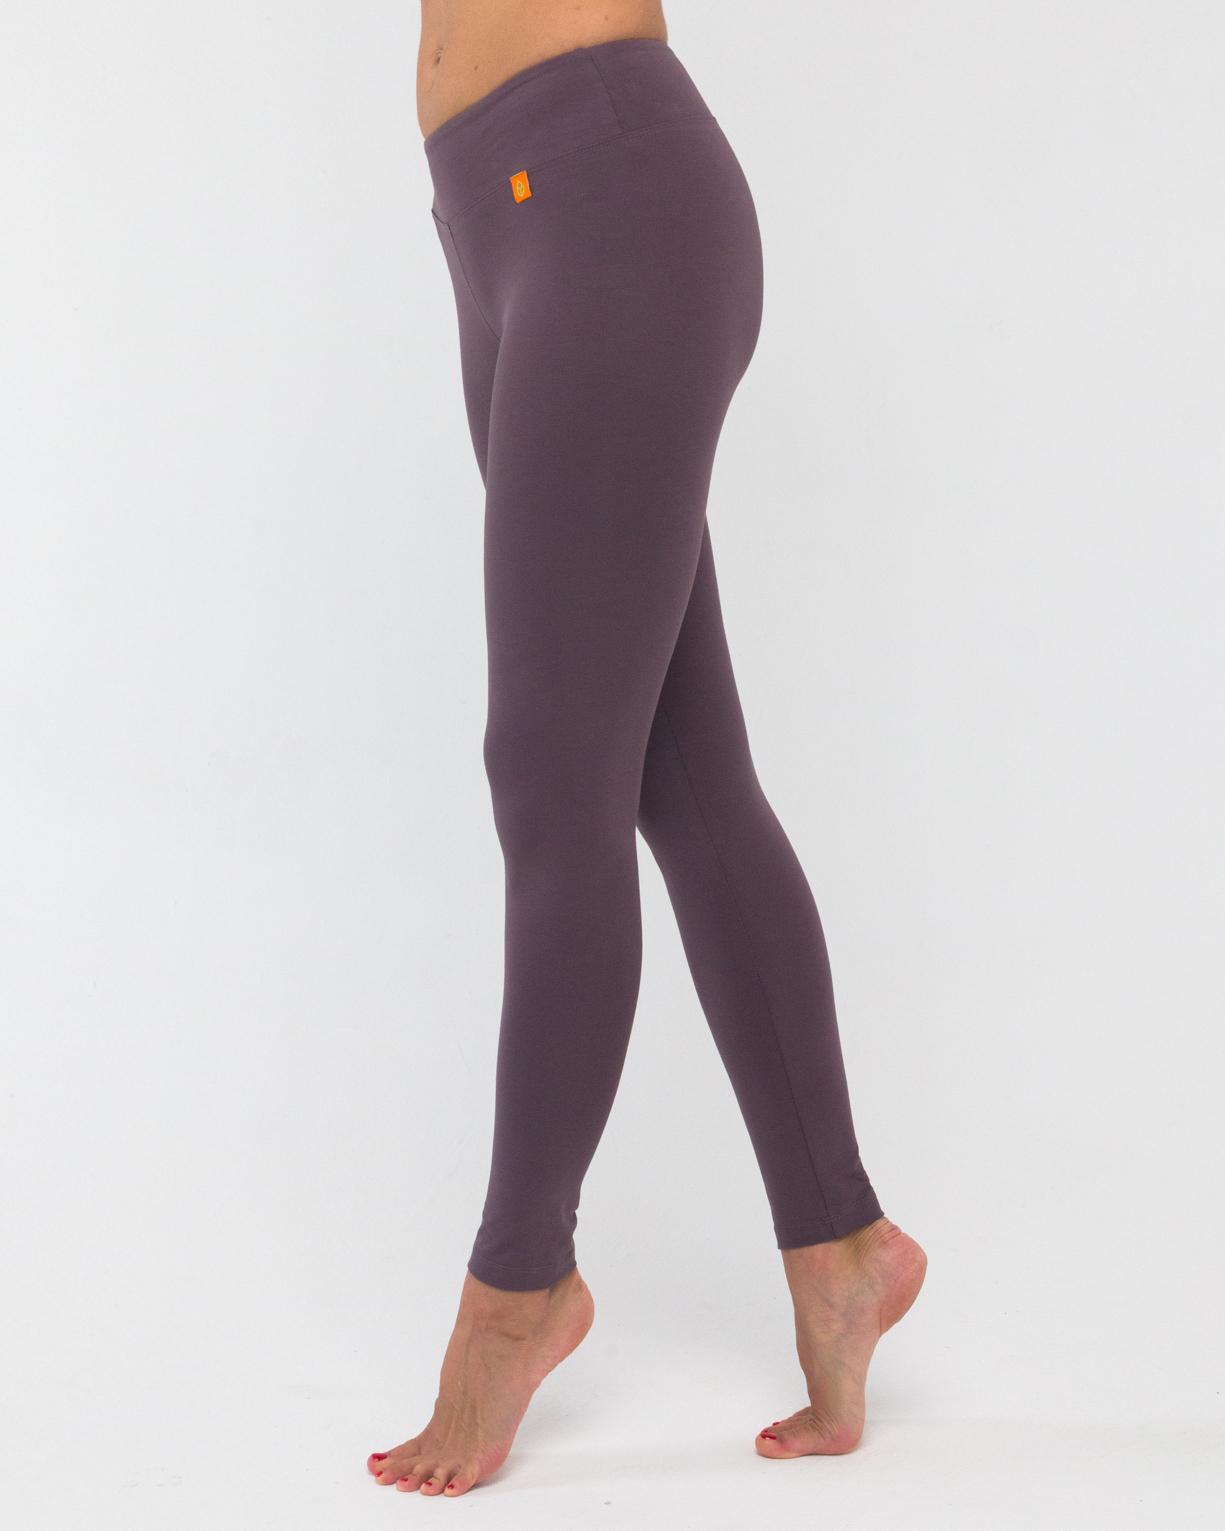 Тайтсы женские Miss Incredible какао YogaDress (0,2 кг, M (46), какао) тайтсы 3 4 kalenji мужские 3 4 тайтсы для бега run dry